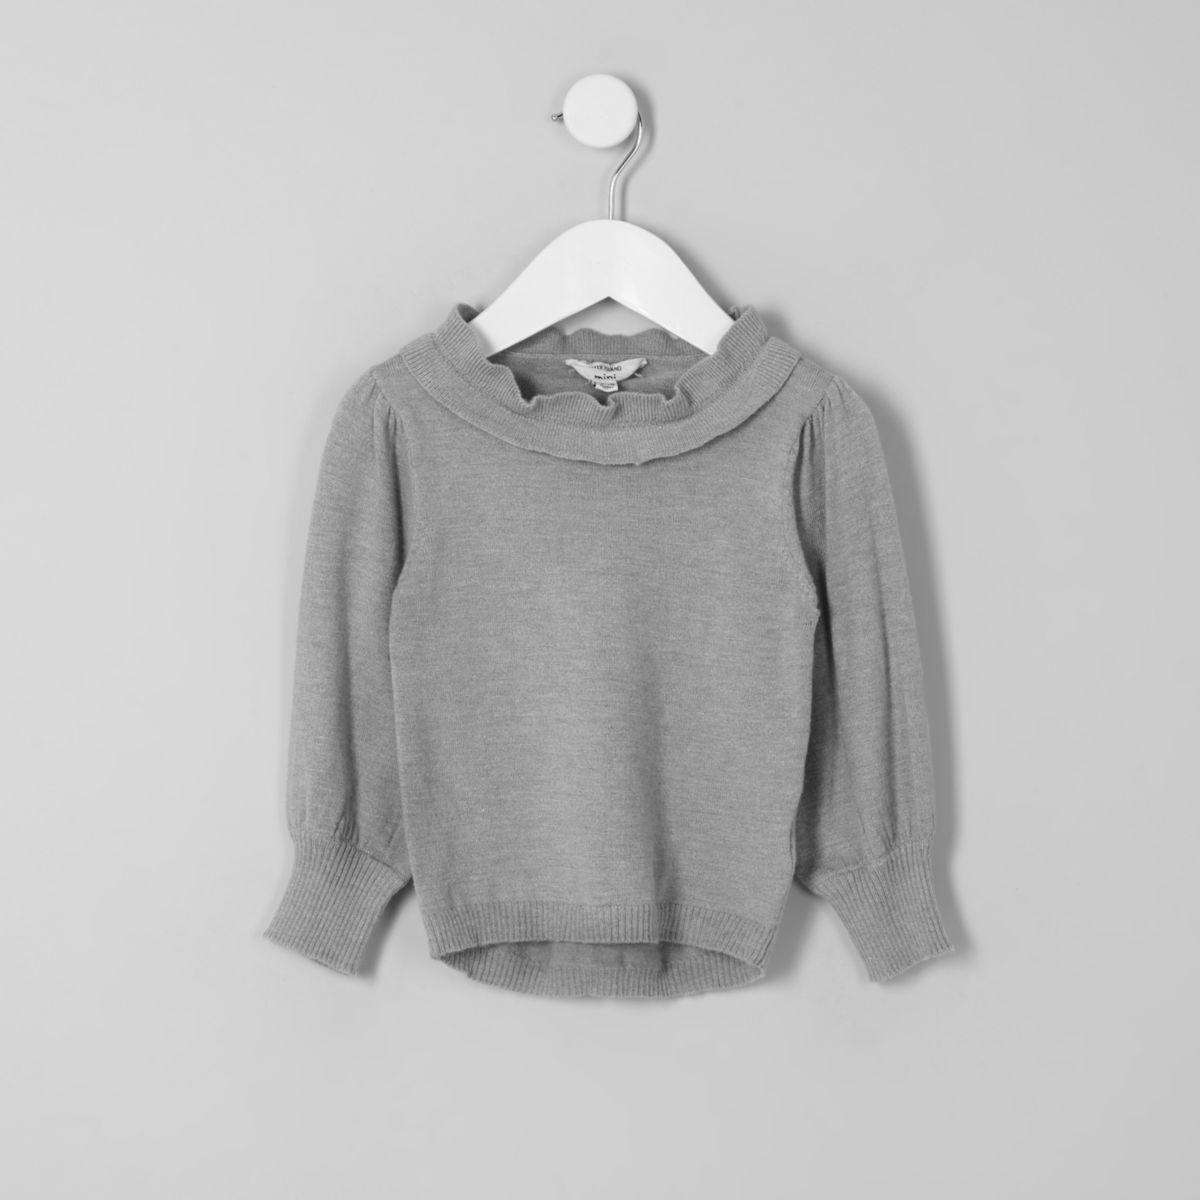 Mini girls grey frill layered neck sweater